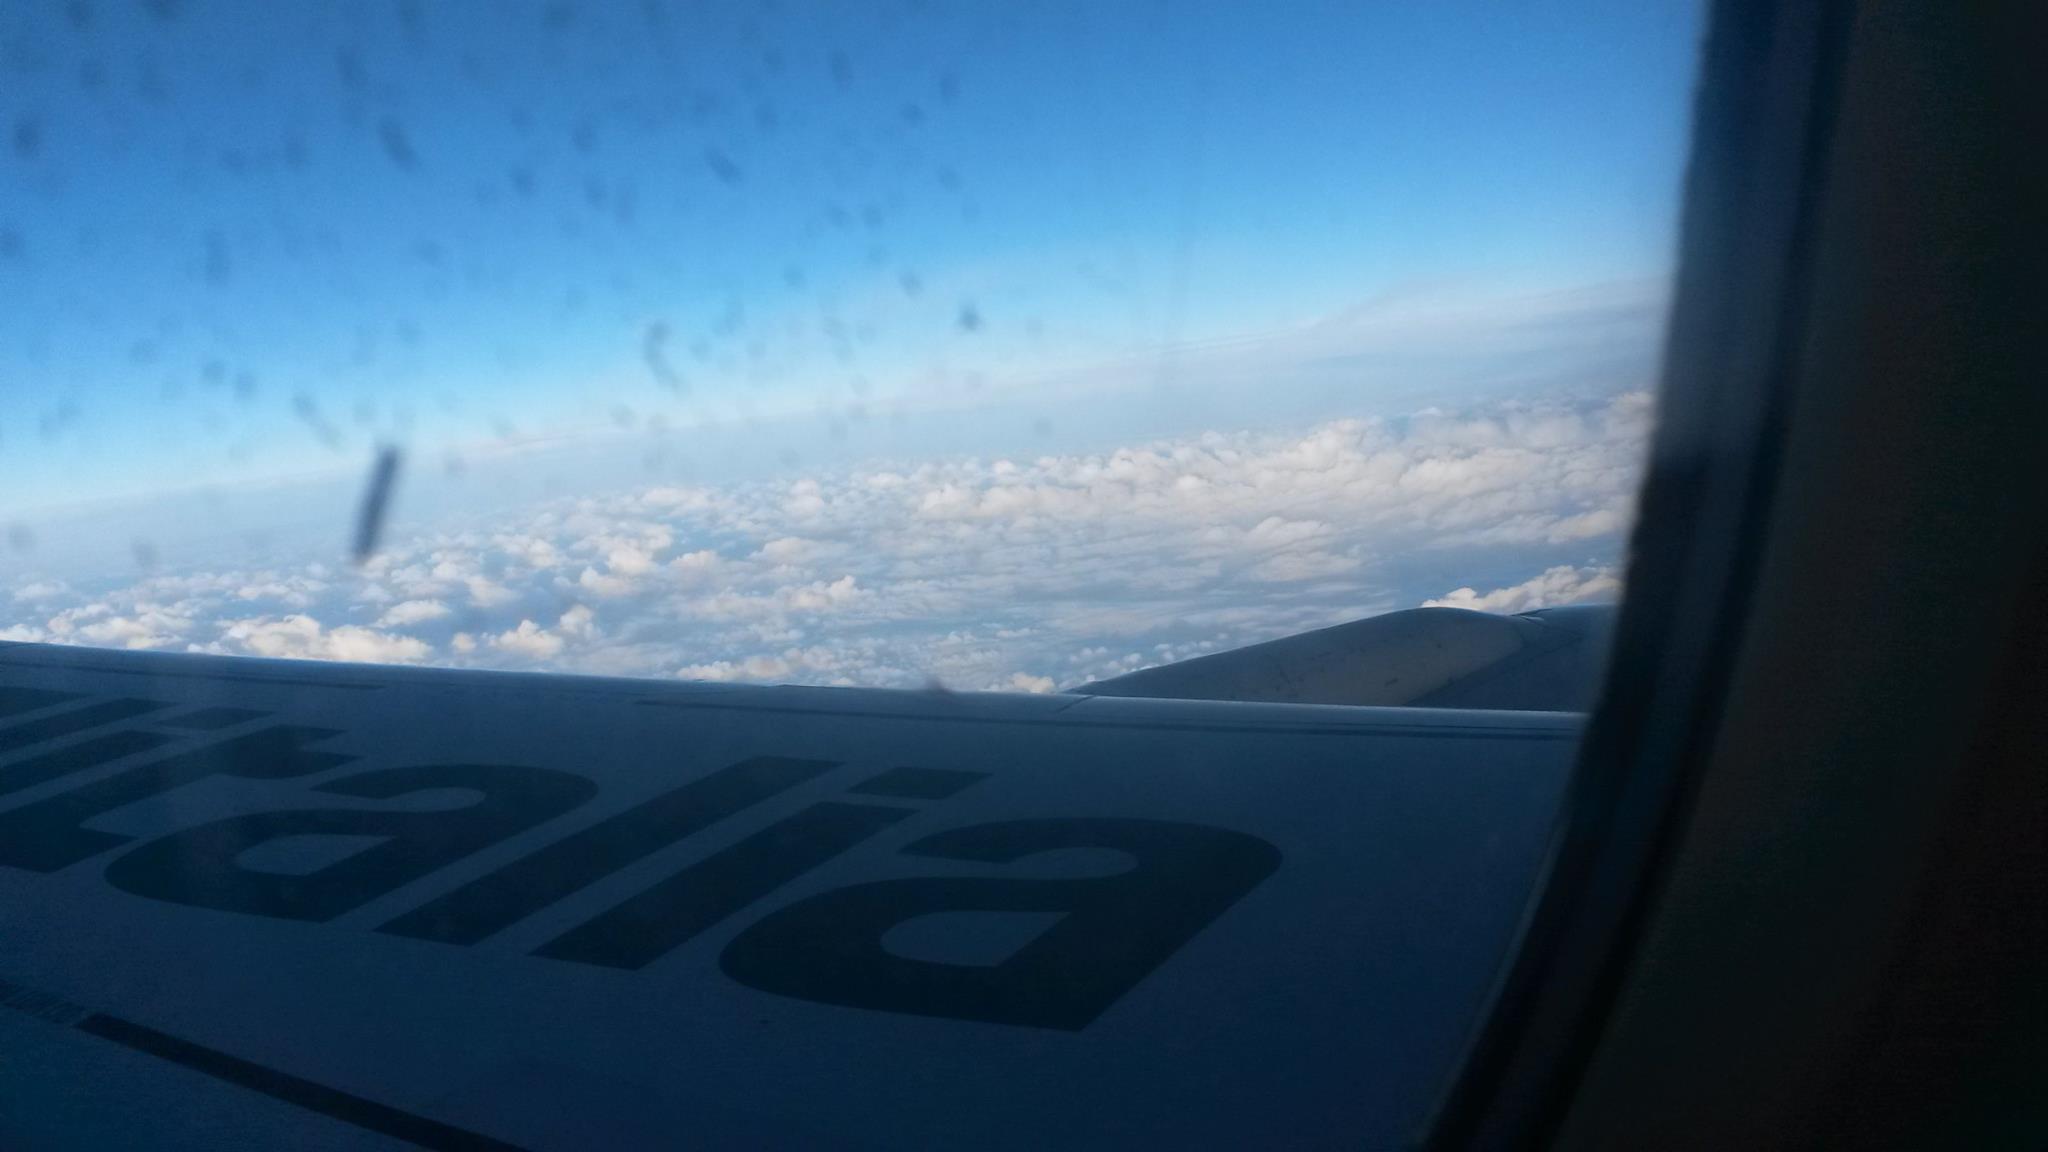 aeroplane rome greece alitalia clouds view